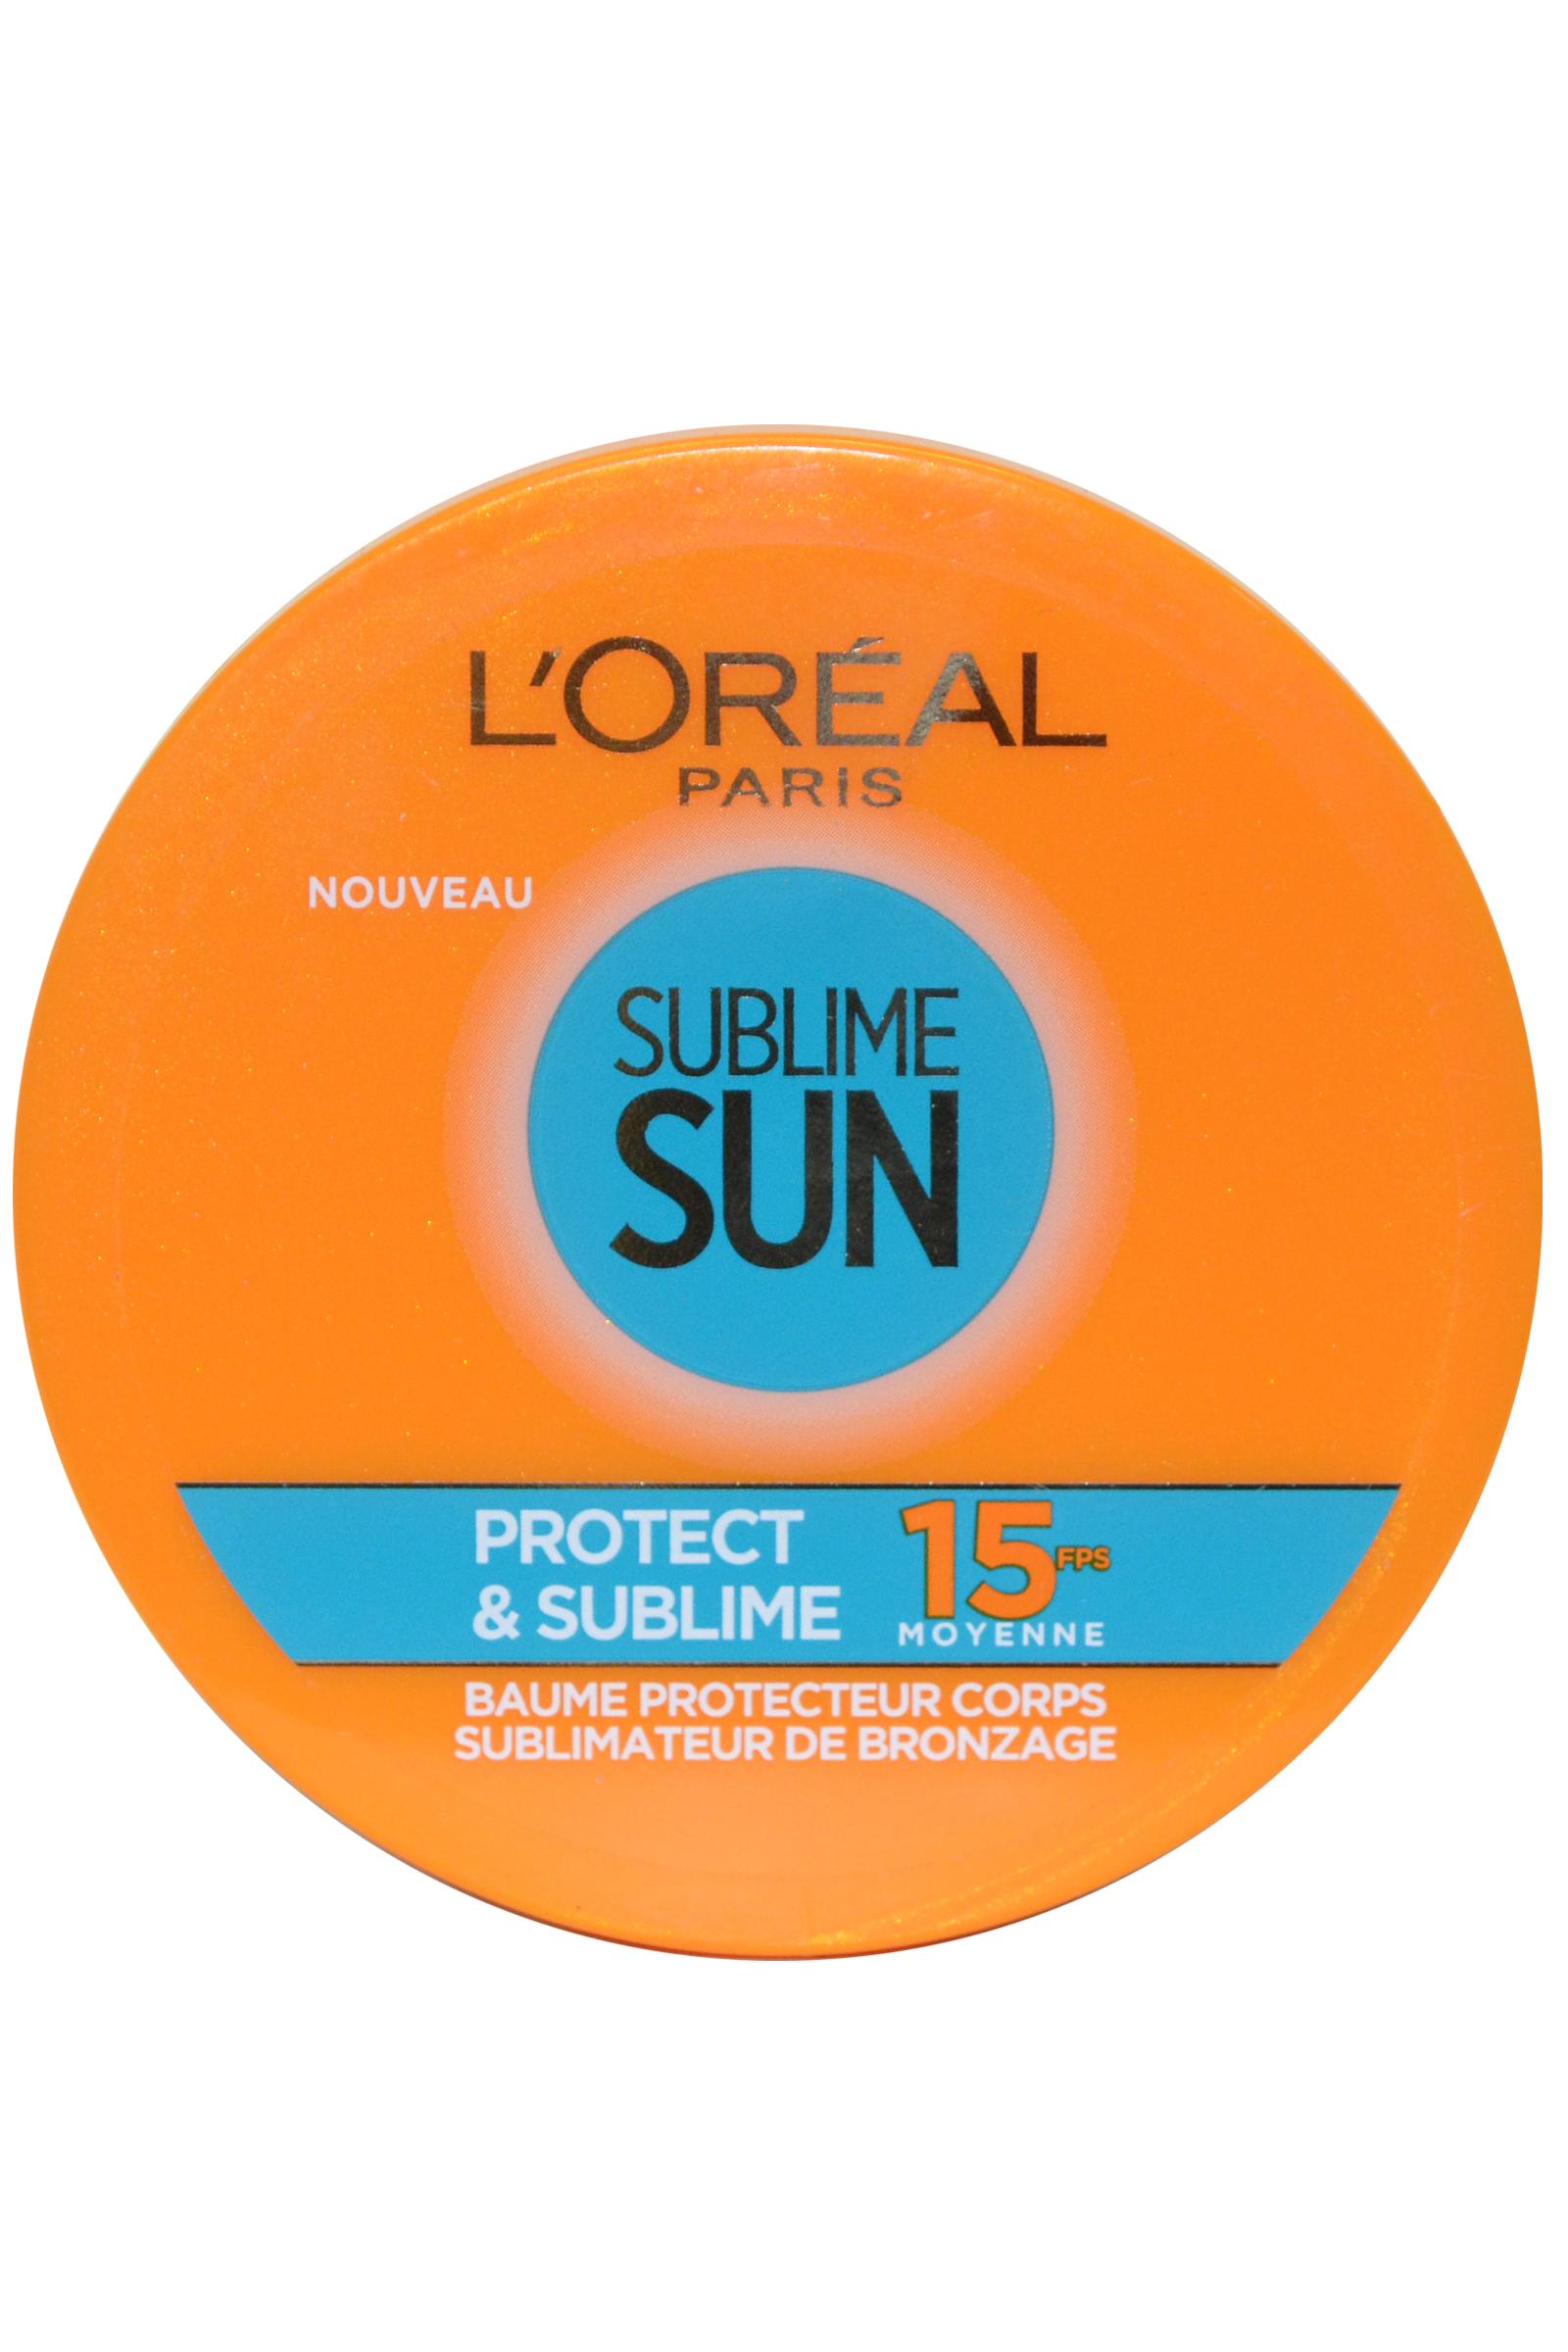 L Oreal Sublime Sun by L'Oreal Body Protect Balm Sublime Sun 100ml SPF15